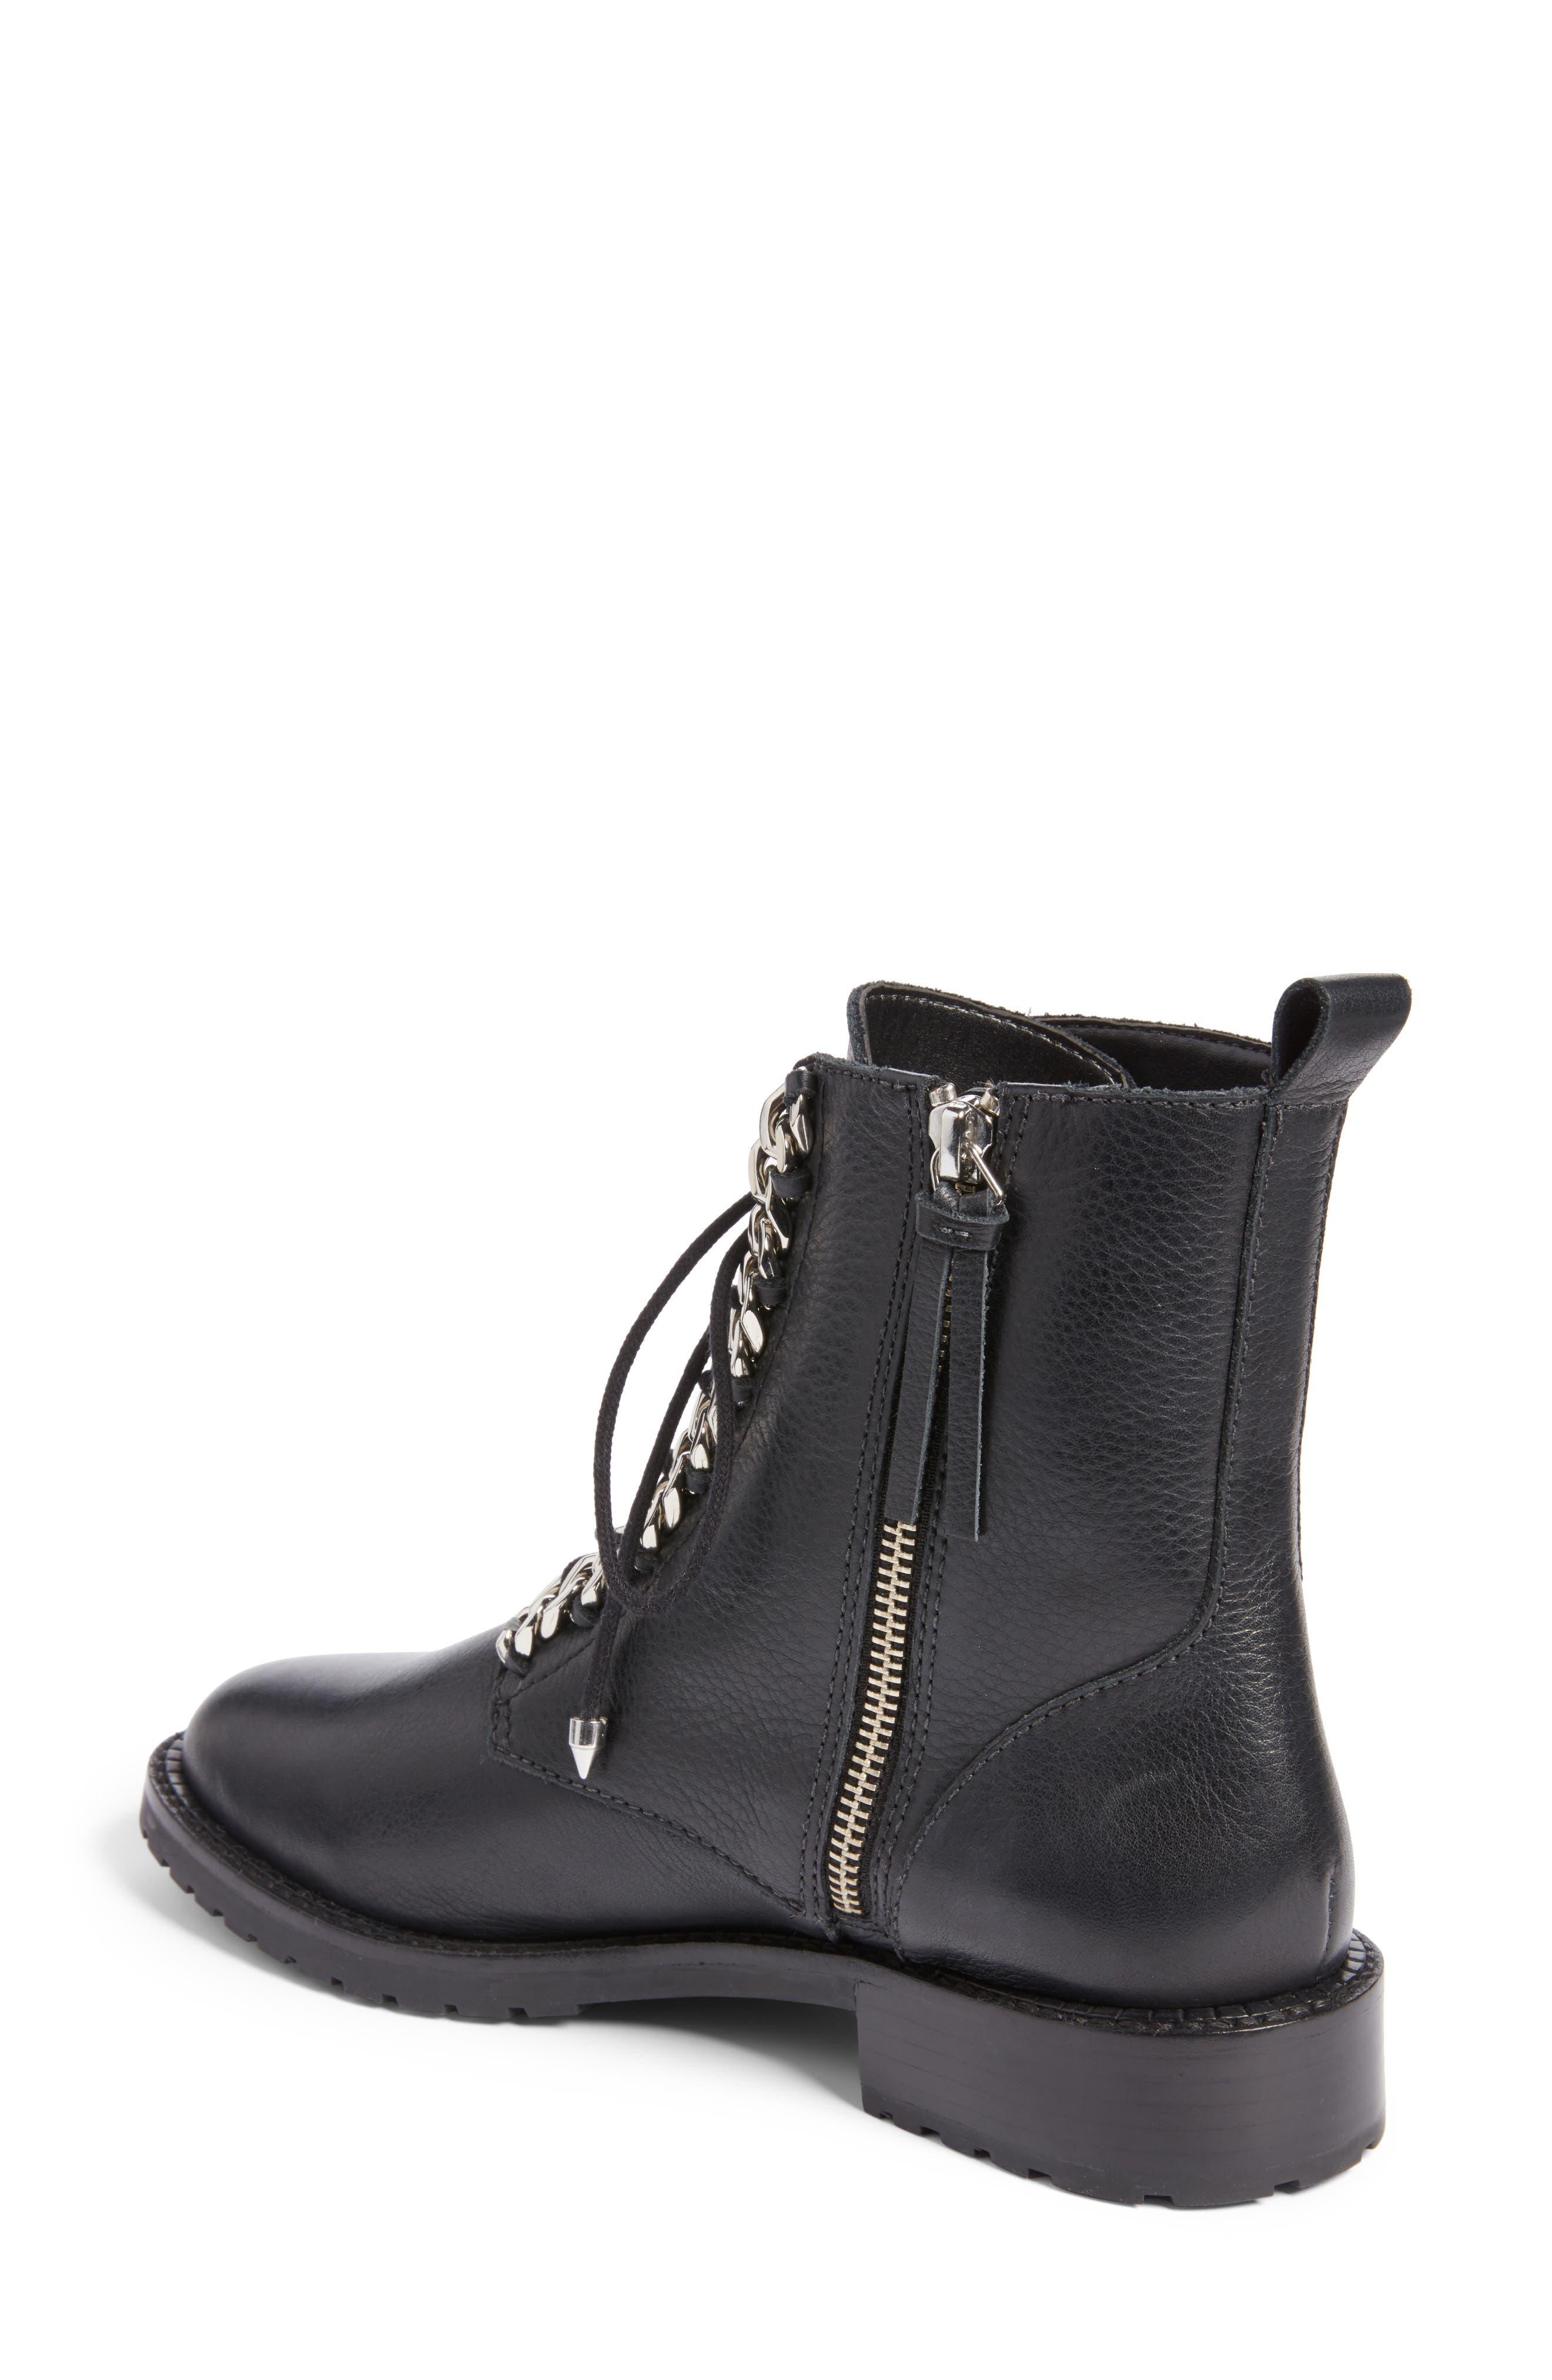 Gian Combat Boot,                             Alternate thumbnail 2, color,                             001